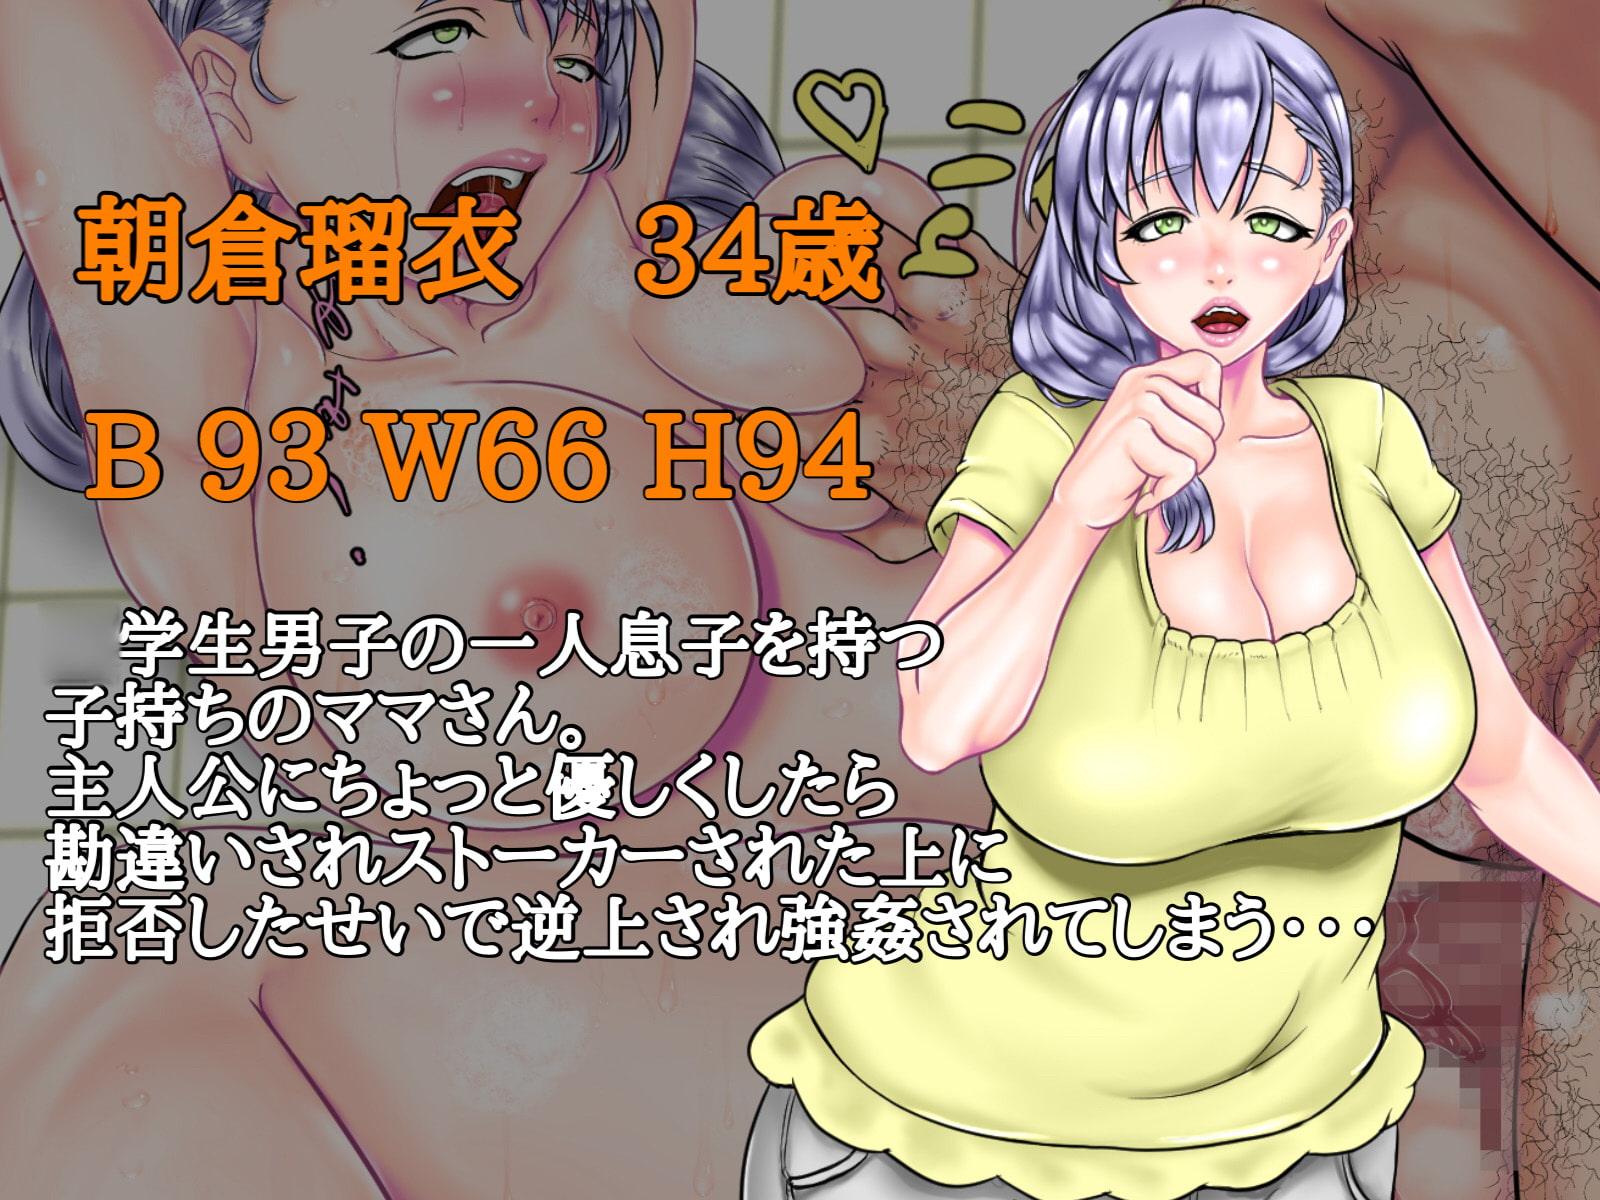 RJ319605 経産婦ママの股間の匂い 巨乳の子持ち人妻をキモオタ劣等遺伝子で孕むまで輪姦壮絶中出しレイプ [20210313]